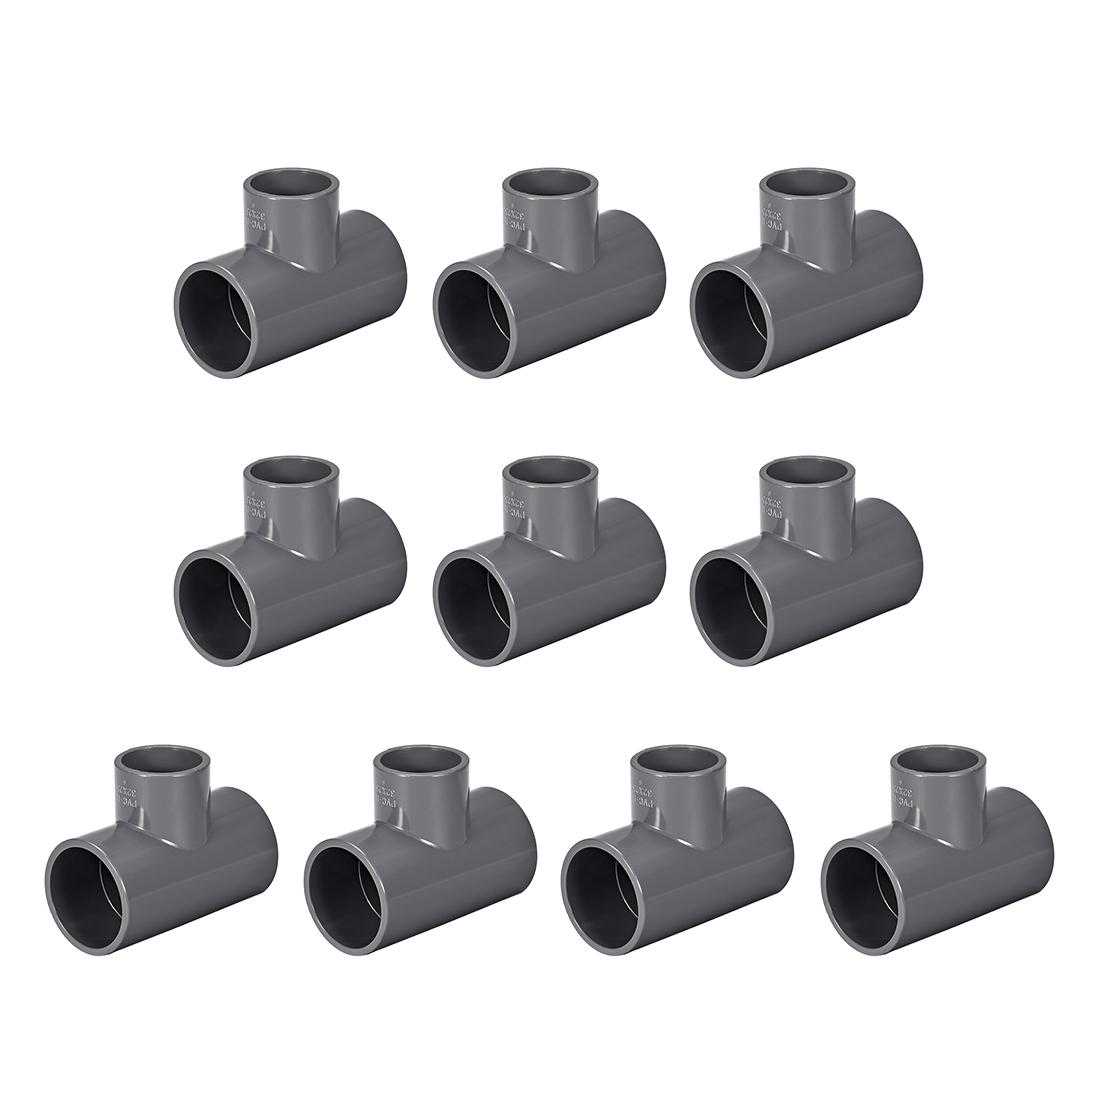 PVC Pipe Fitting Tee 401-Series 1-1/4-inch X 1-inch Socket Gray 10pcs